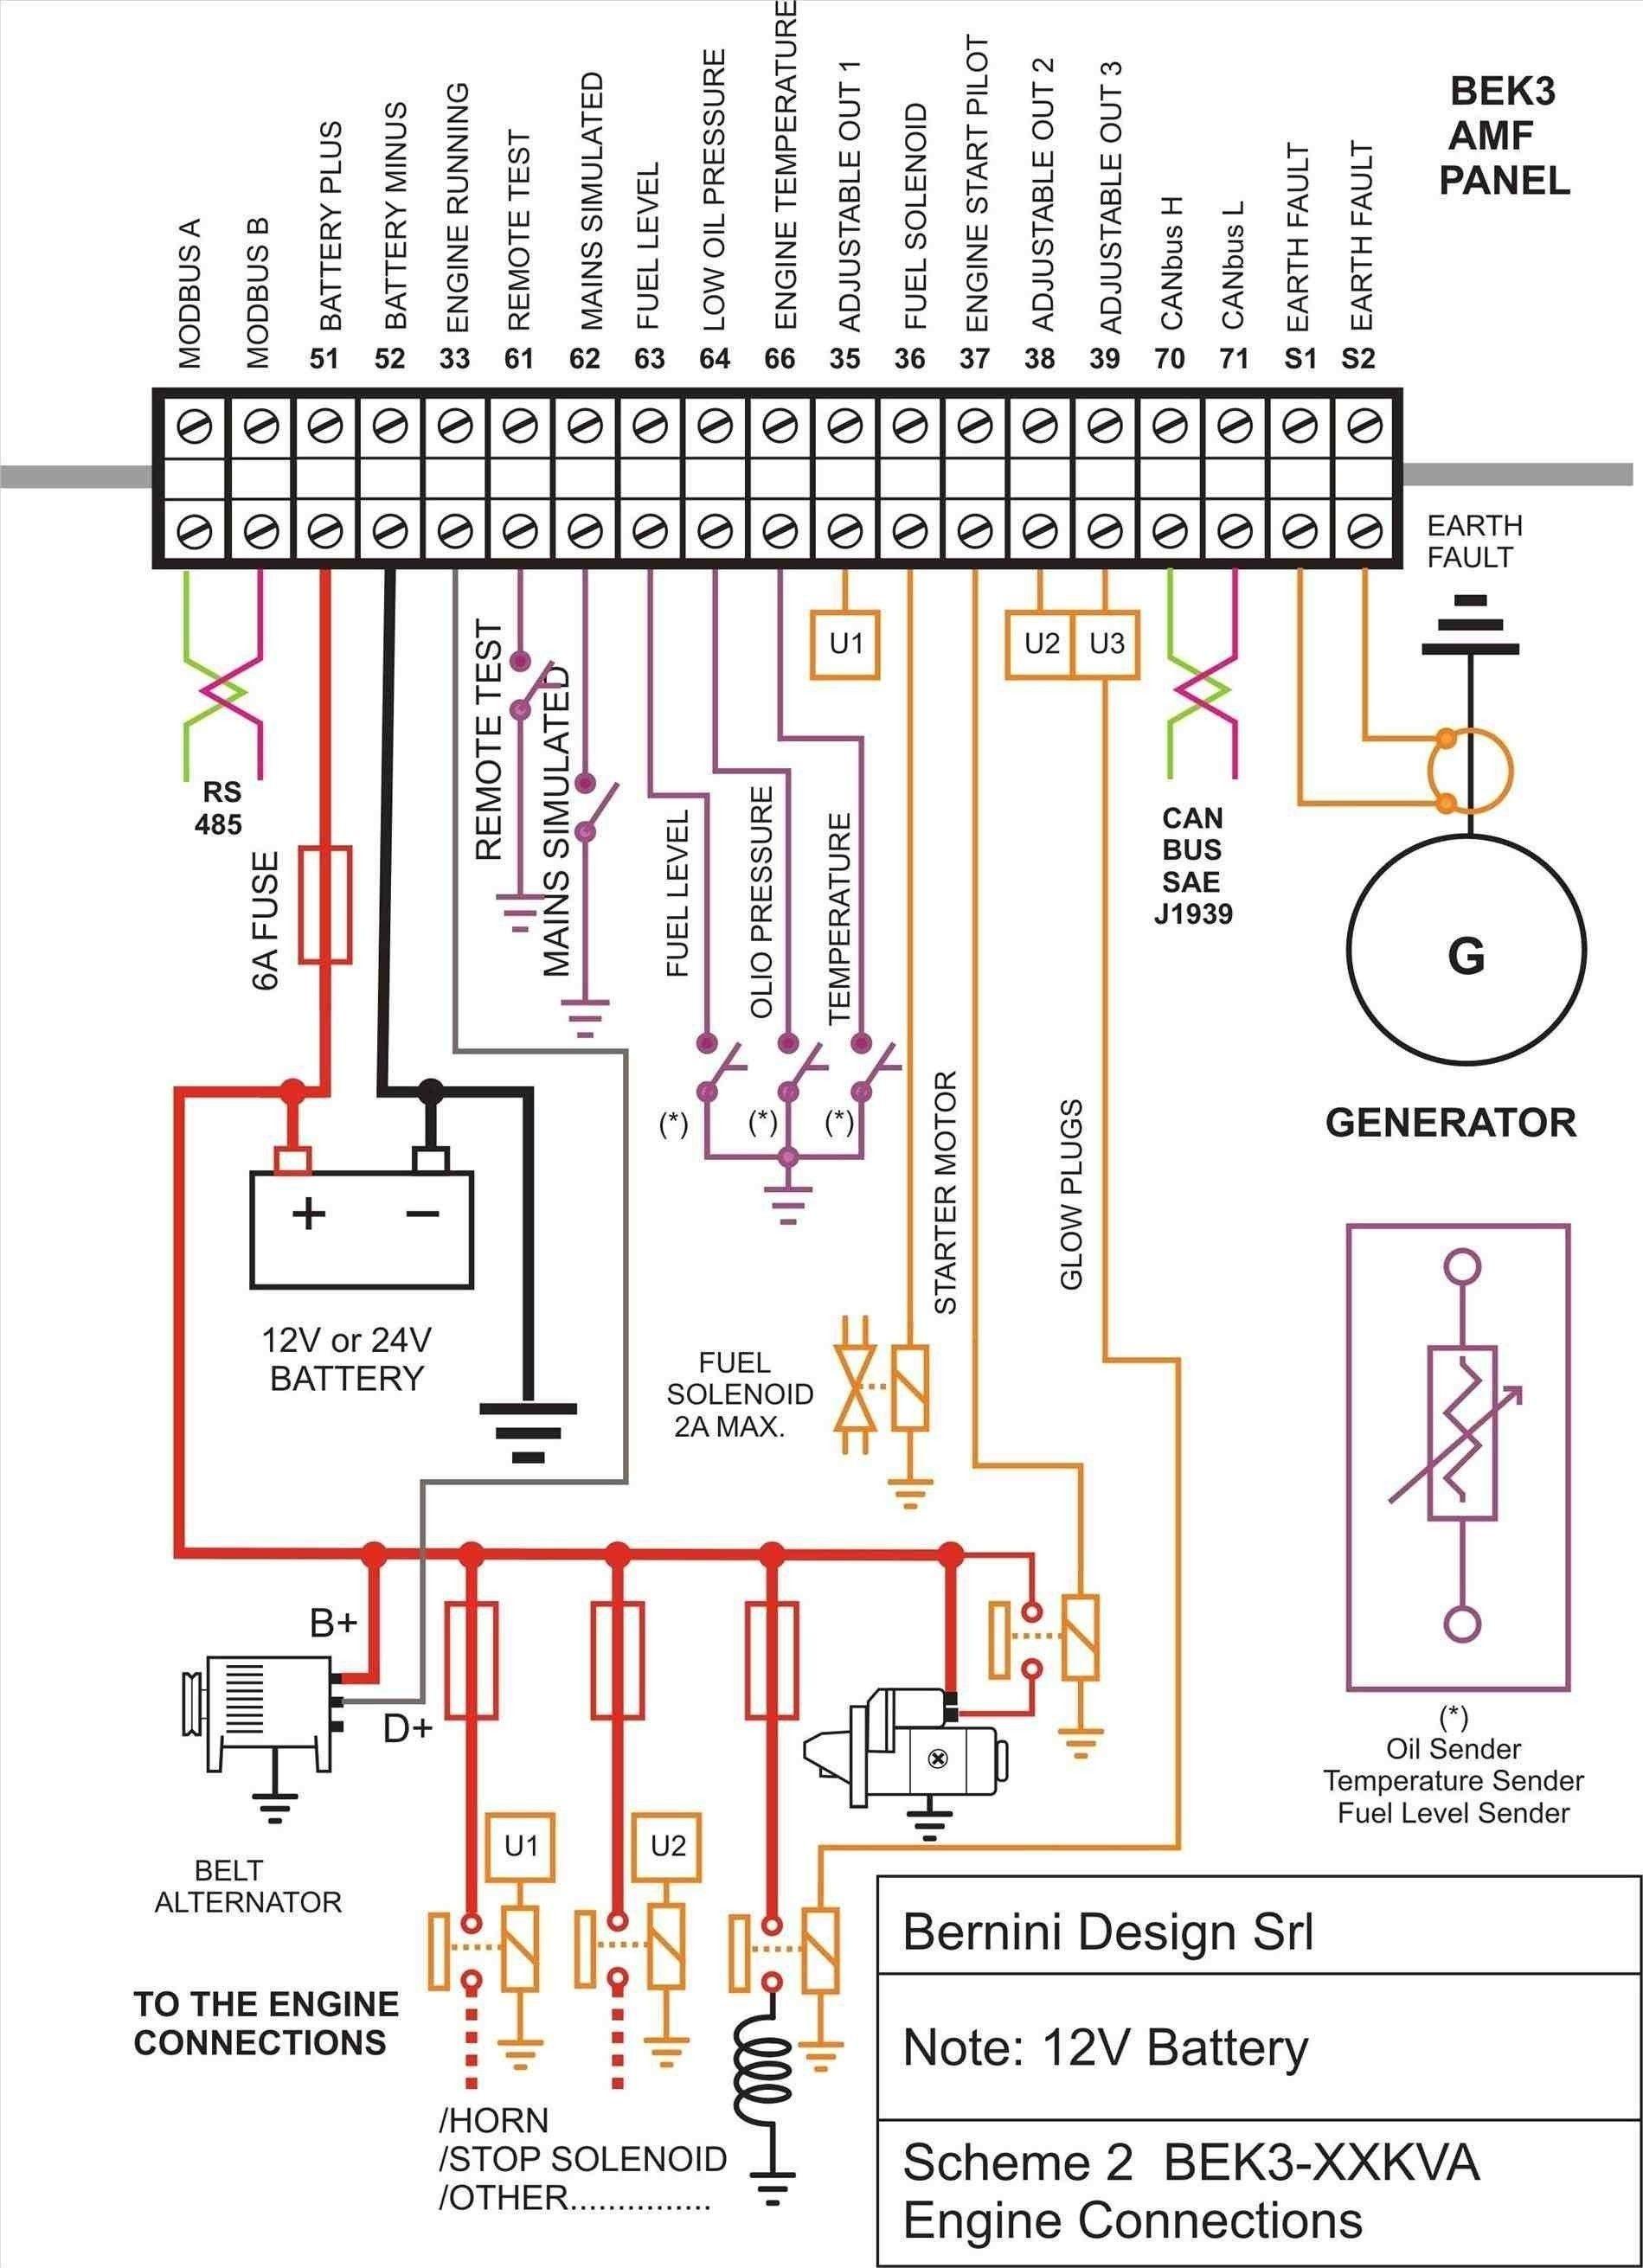 new wiring diagram for house lighting circuit pdf #diagram #diagramsample # diagram… | electrical circuit diagram, electrical wiring diagram,  electrical panel wiring  pinterest